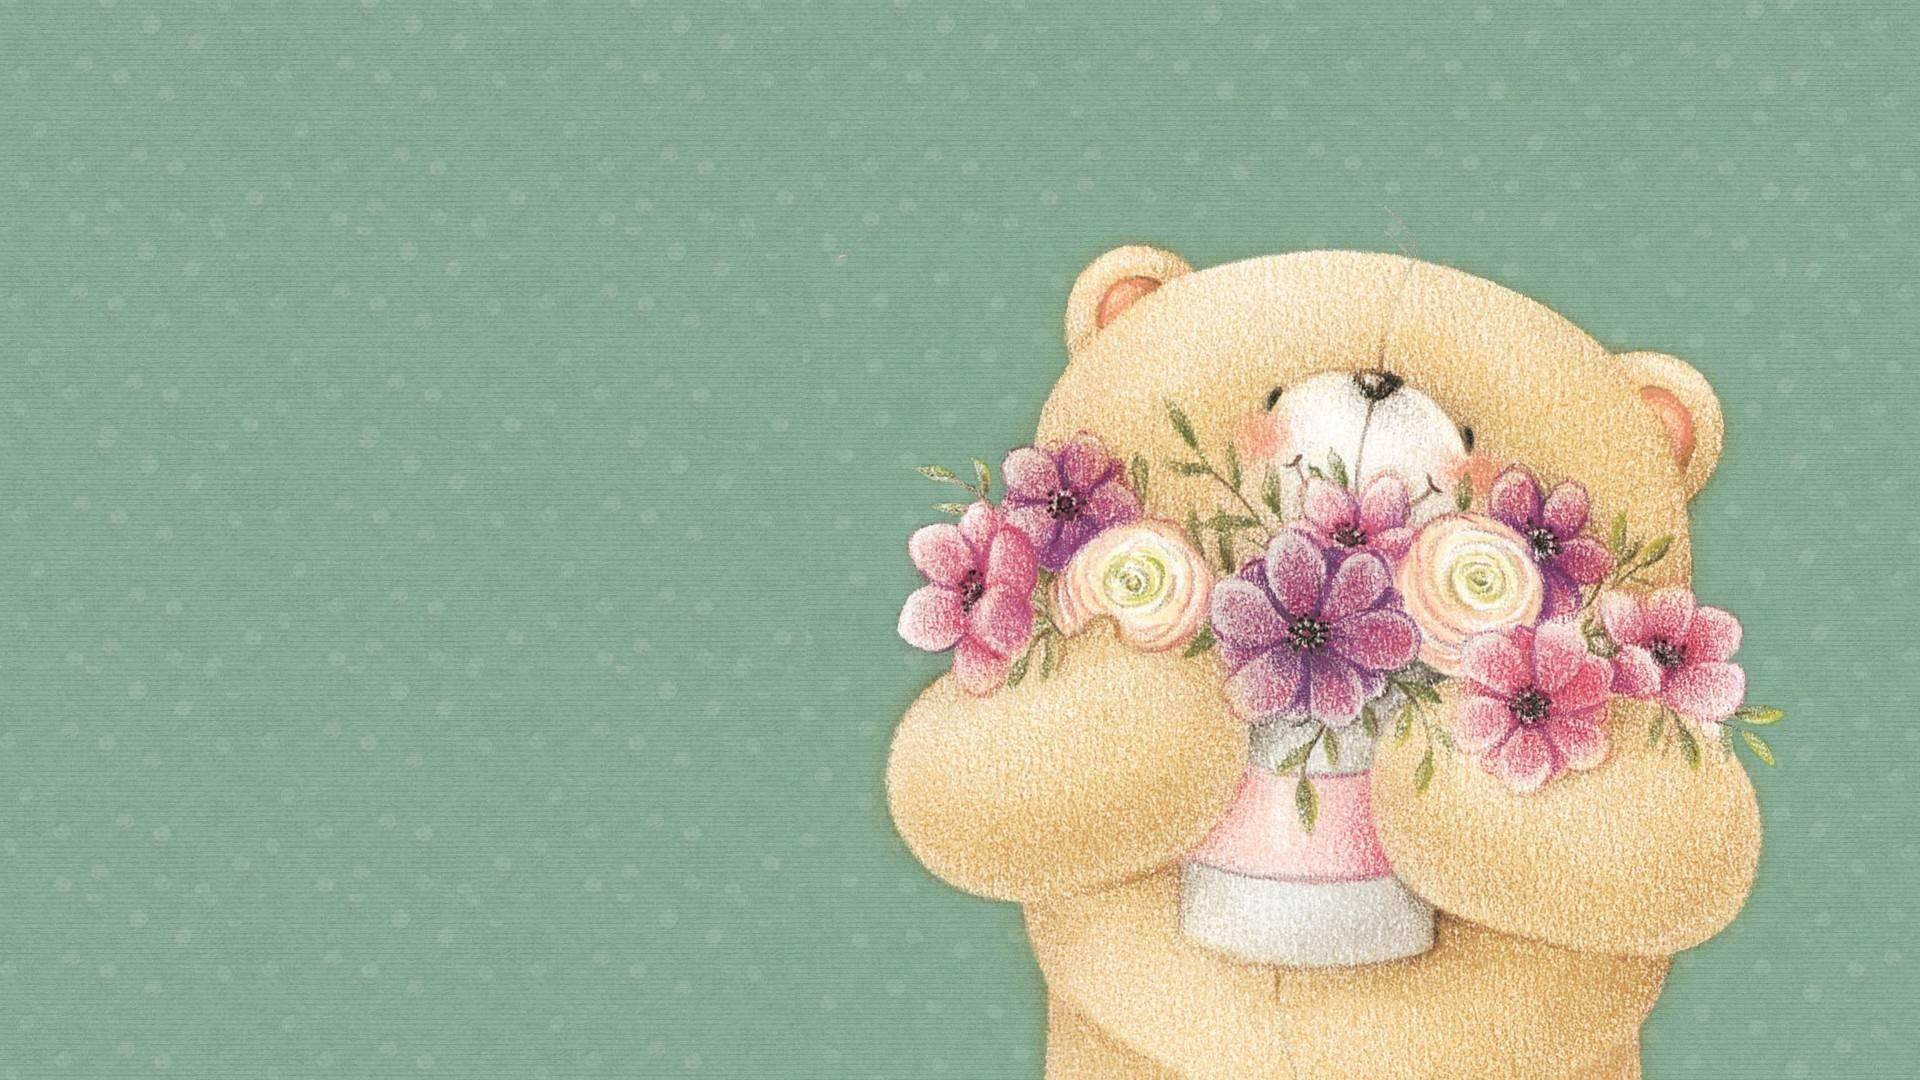 Wallpaper Flowers Toy Pink Art Hand Petal Teddy Bear Flower